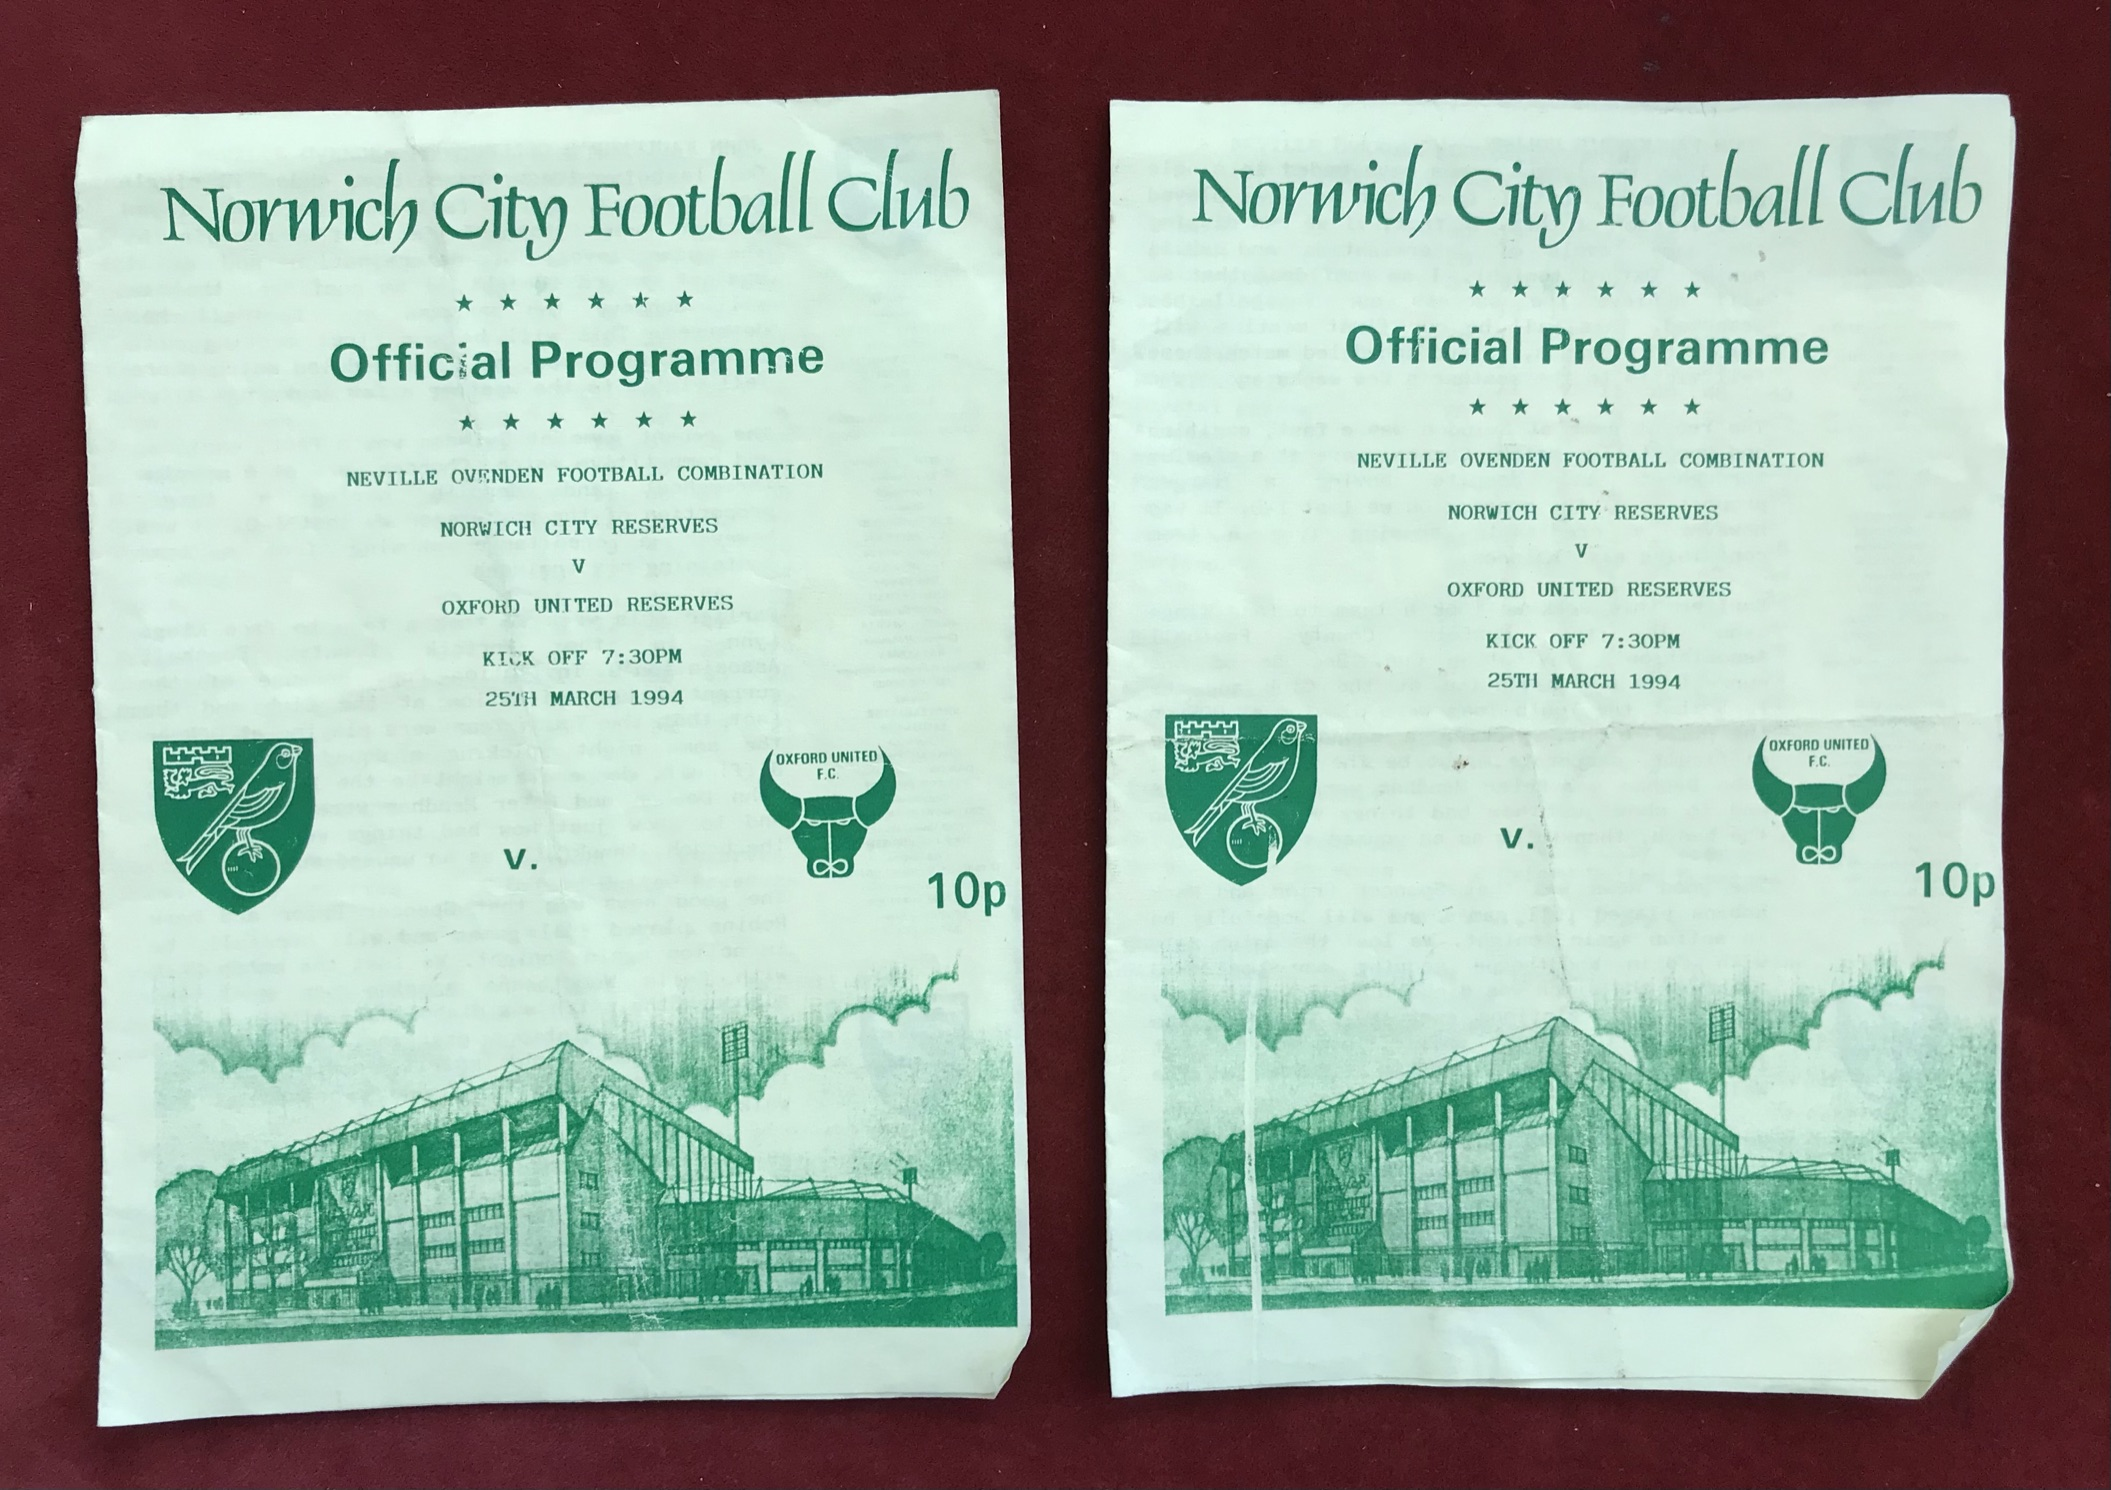 Norwich City Reserves 1971-73 - Chelsea Reserves 9 Dec 1972. Chelsea Reserves v Arsenal Reserves - Image 4 of 4